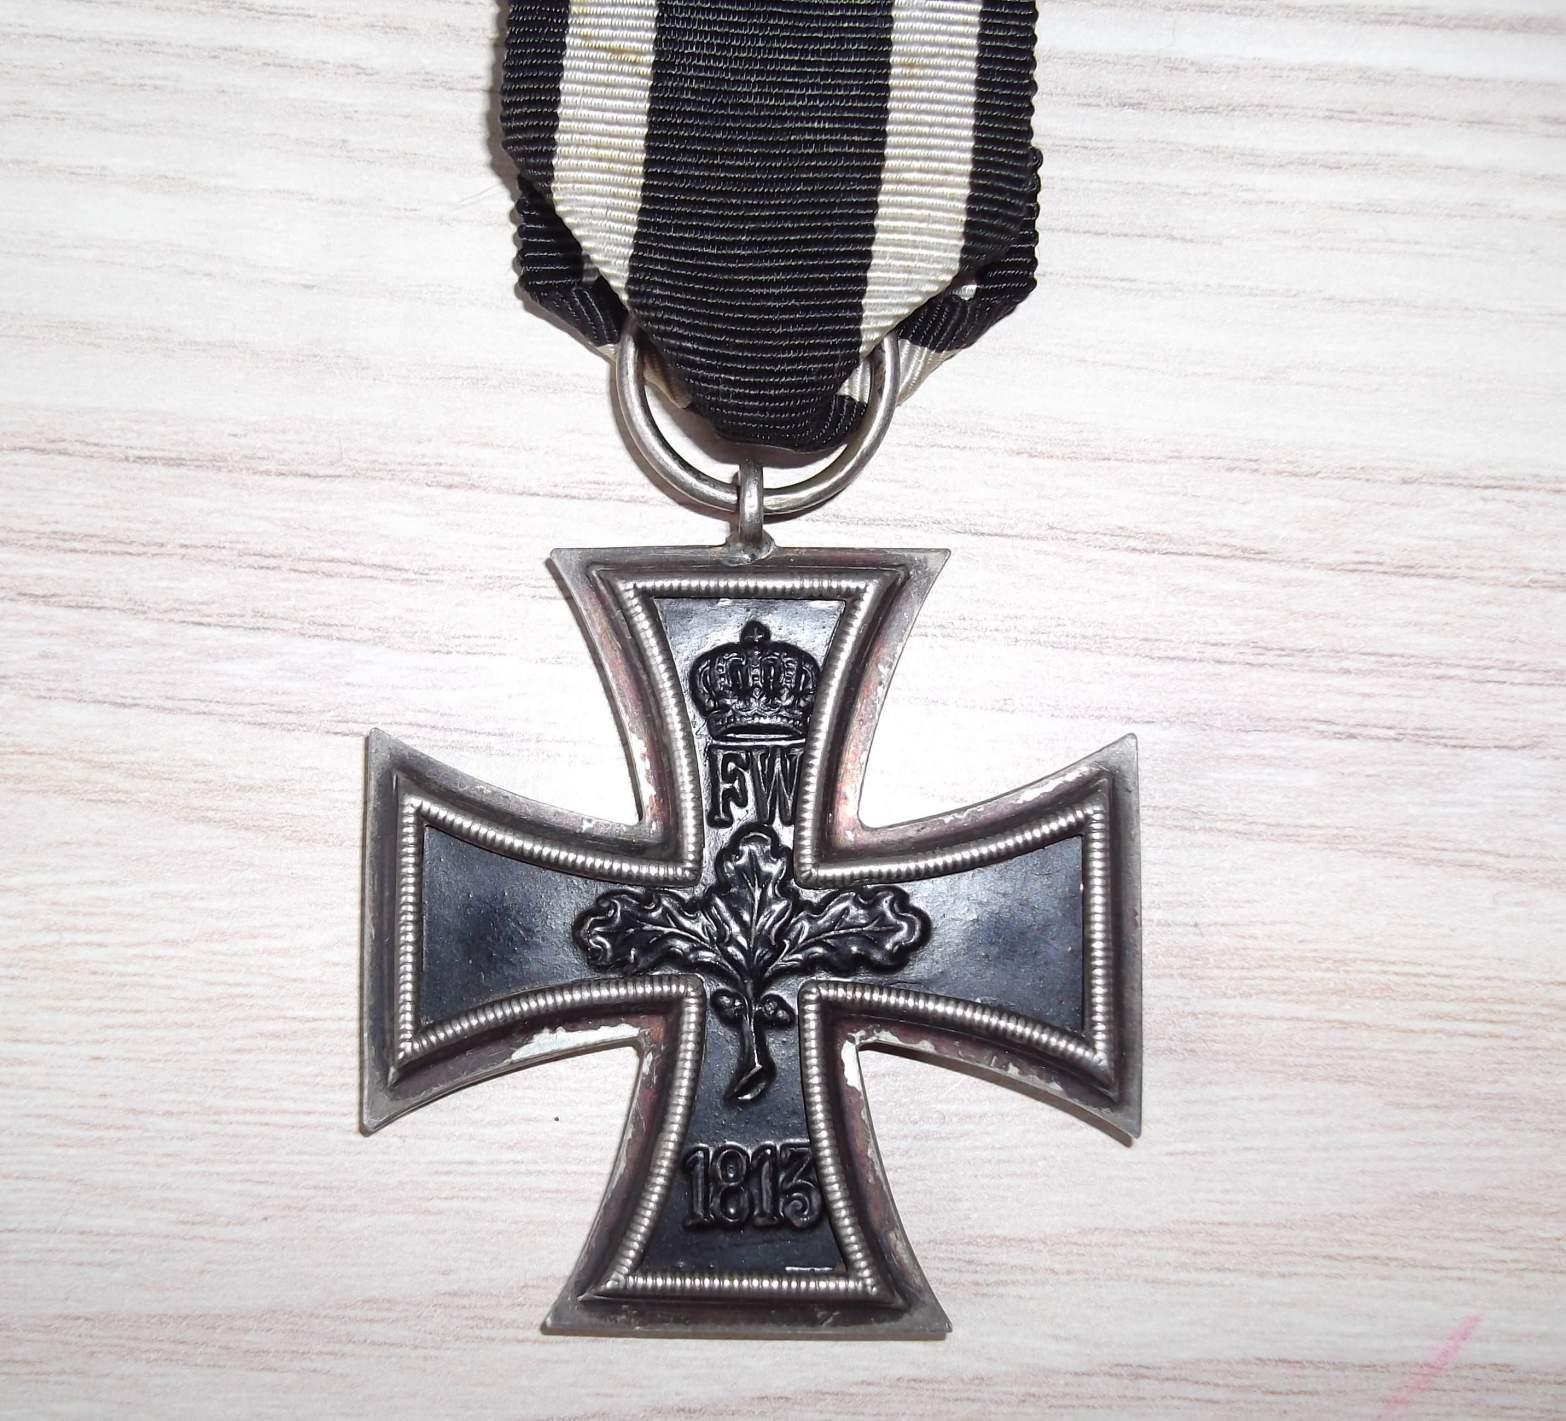 WW2 German, Soviet, Allied militaria, uniforms, awards